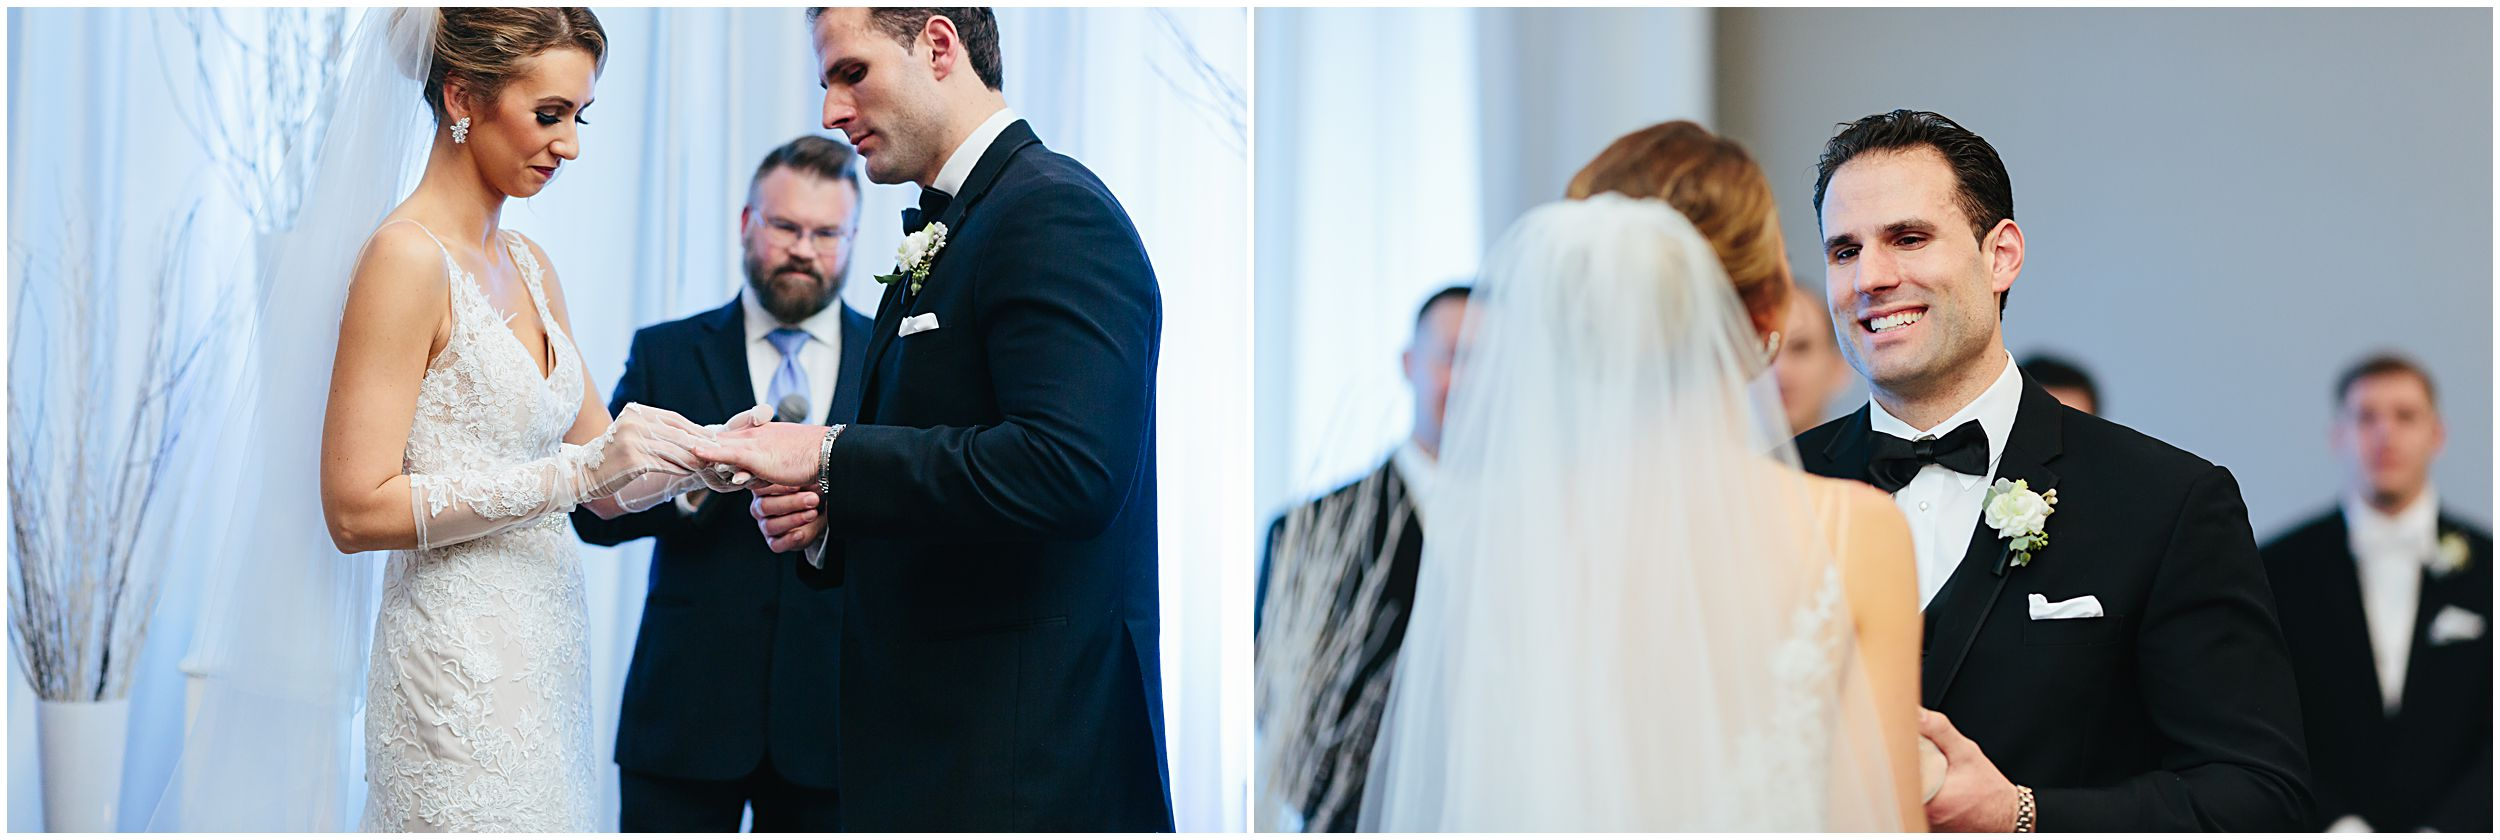 pittsburgh_wedding_photographer_0114.jpg